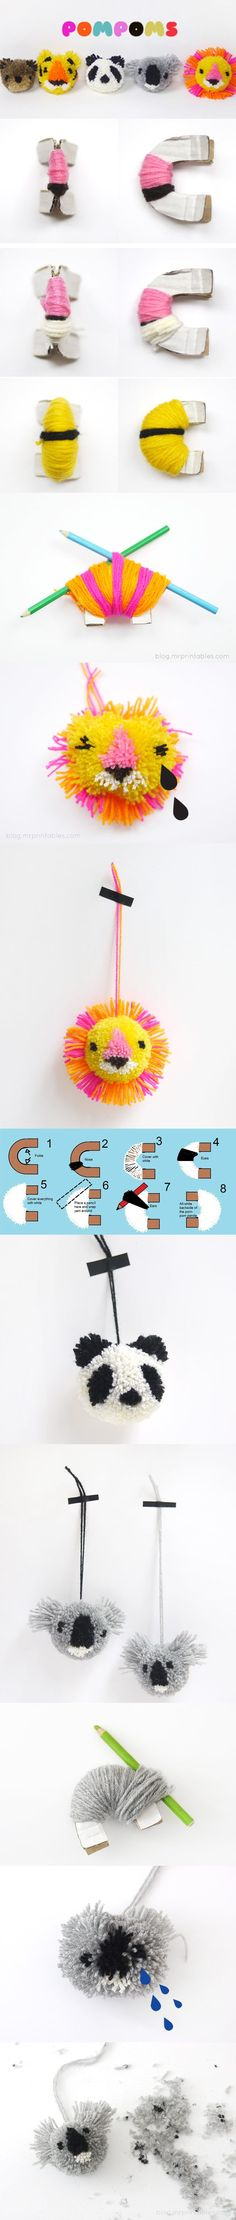 Ponpons lion, panda, koala Mrprintables.com: